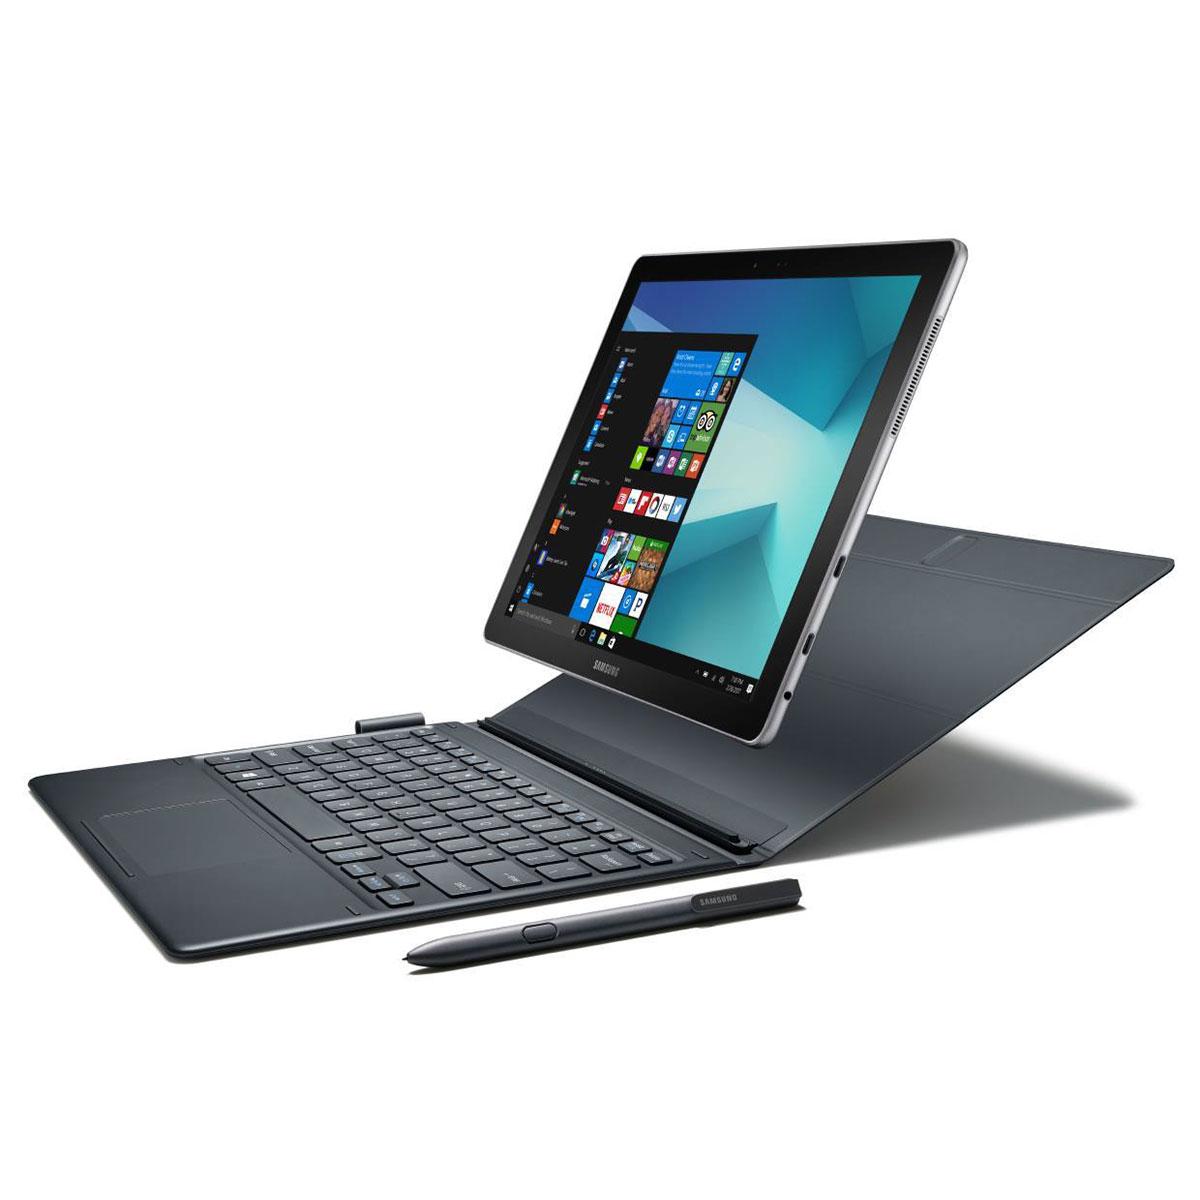 Samsung Galaxy Book W620 - Tablette tactile Samsung - Cybertek.fr - 4